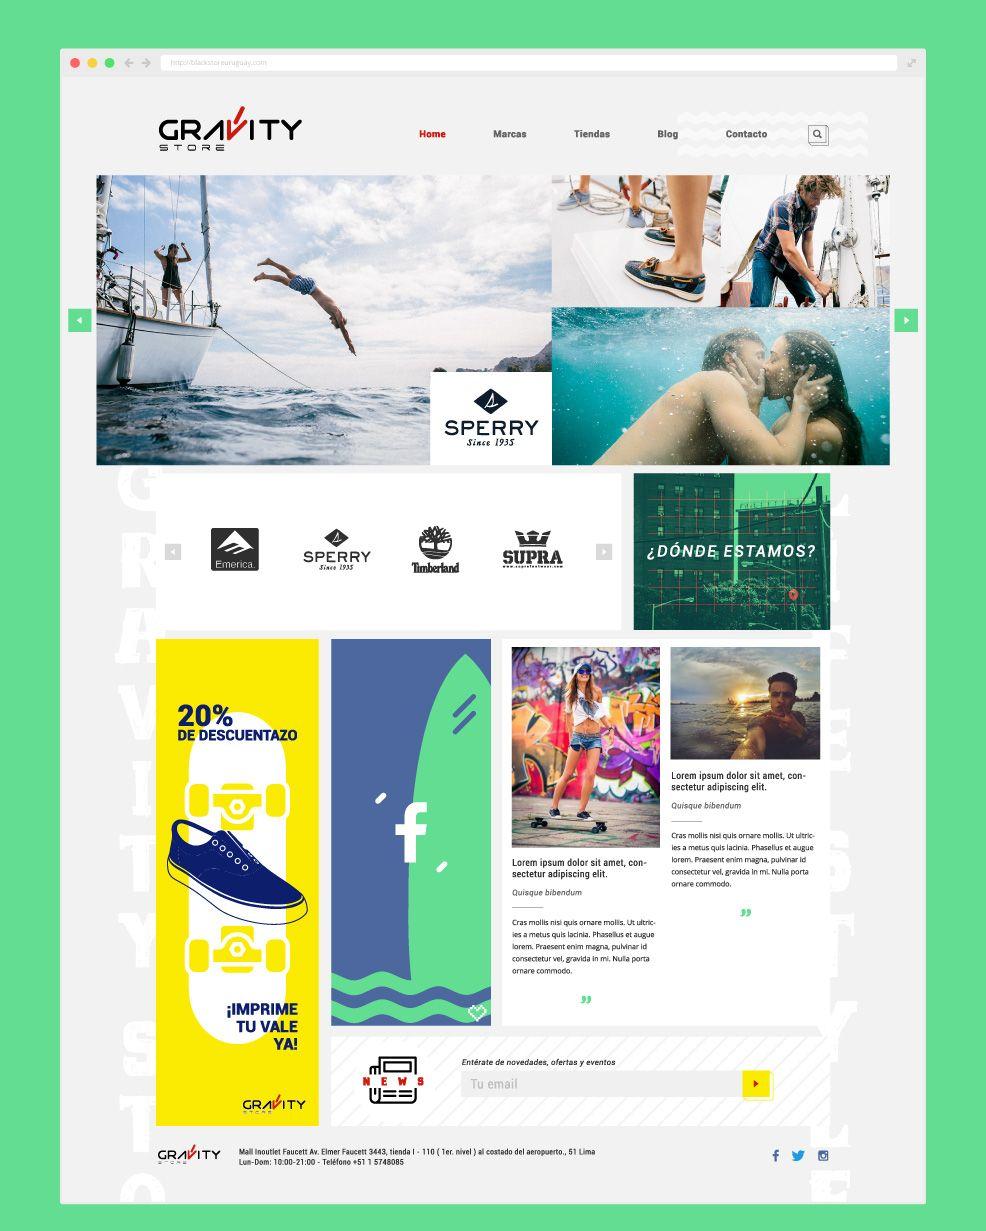 diseño web responsivo para la tienda Gravity